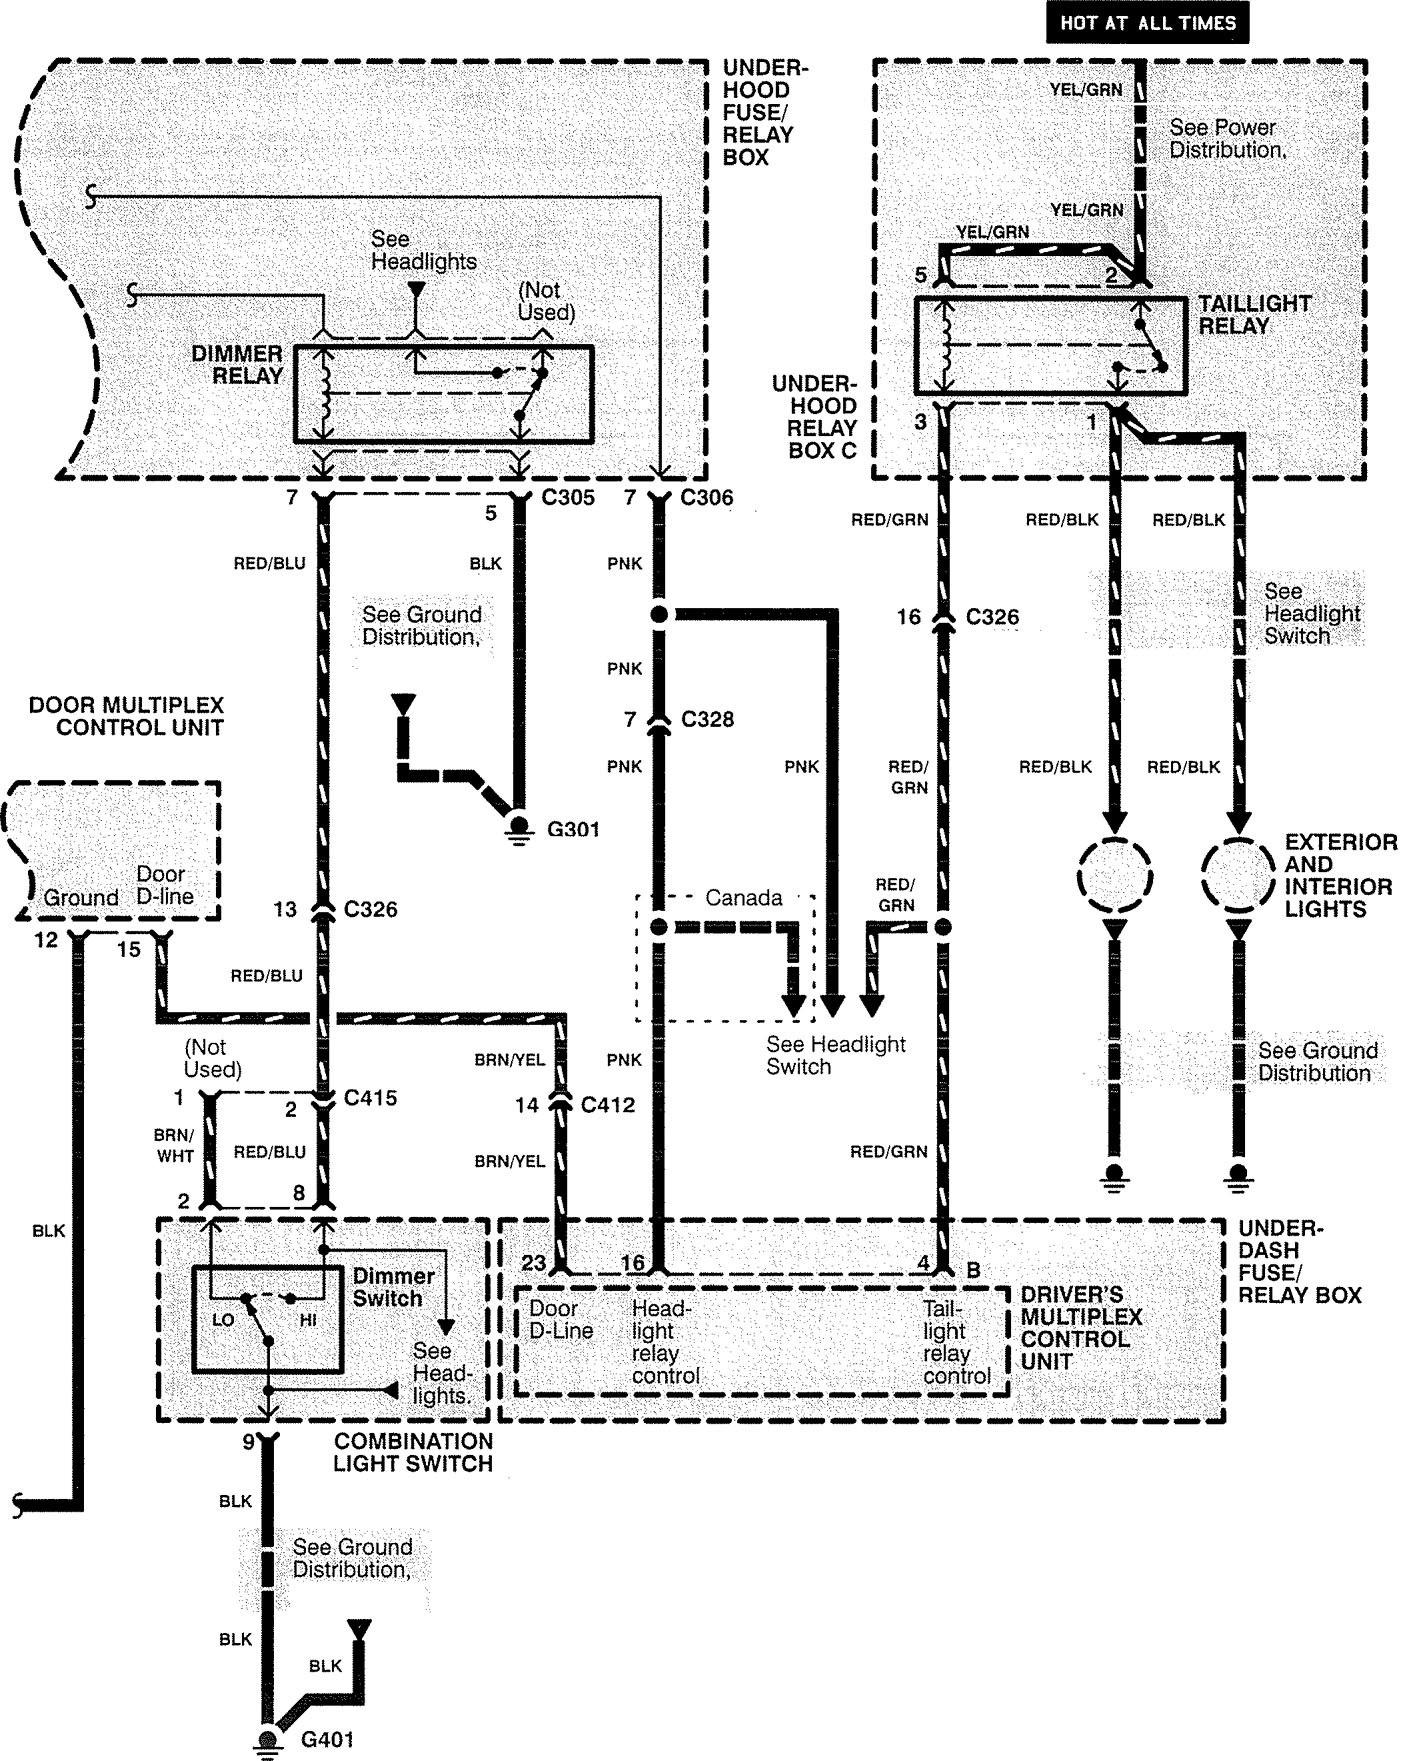 acura rl  1999  - wiring diagrams  anti